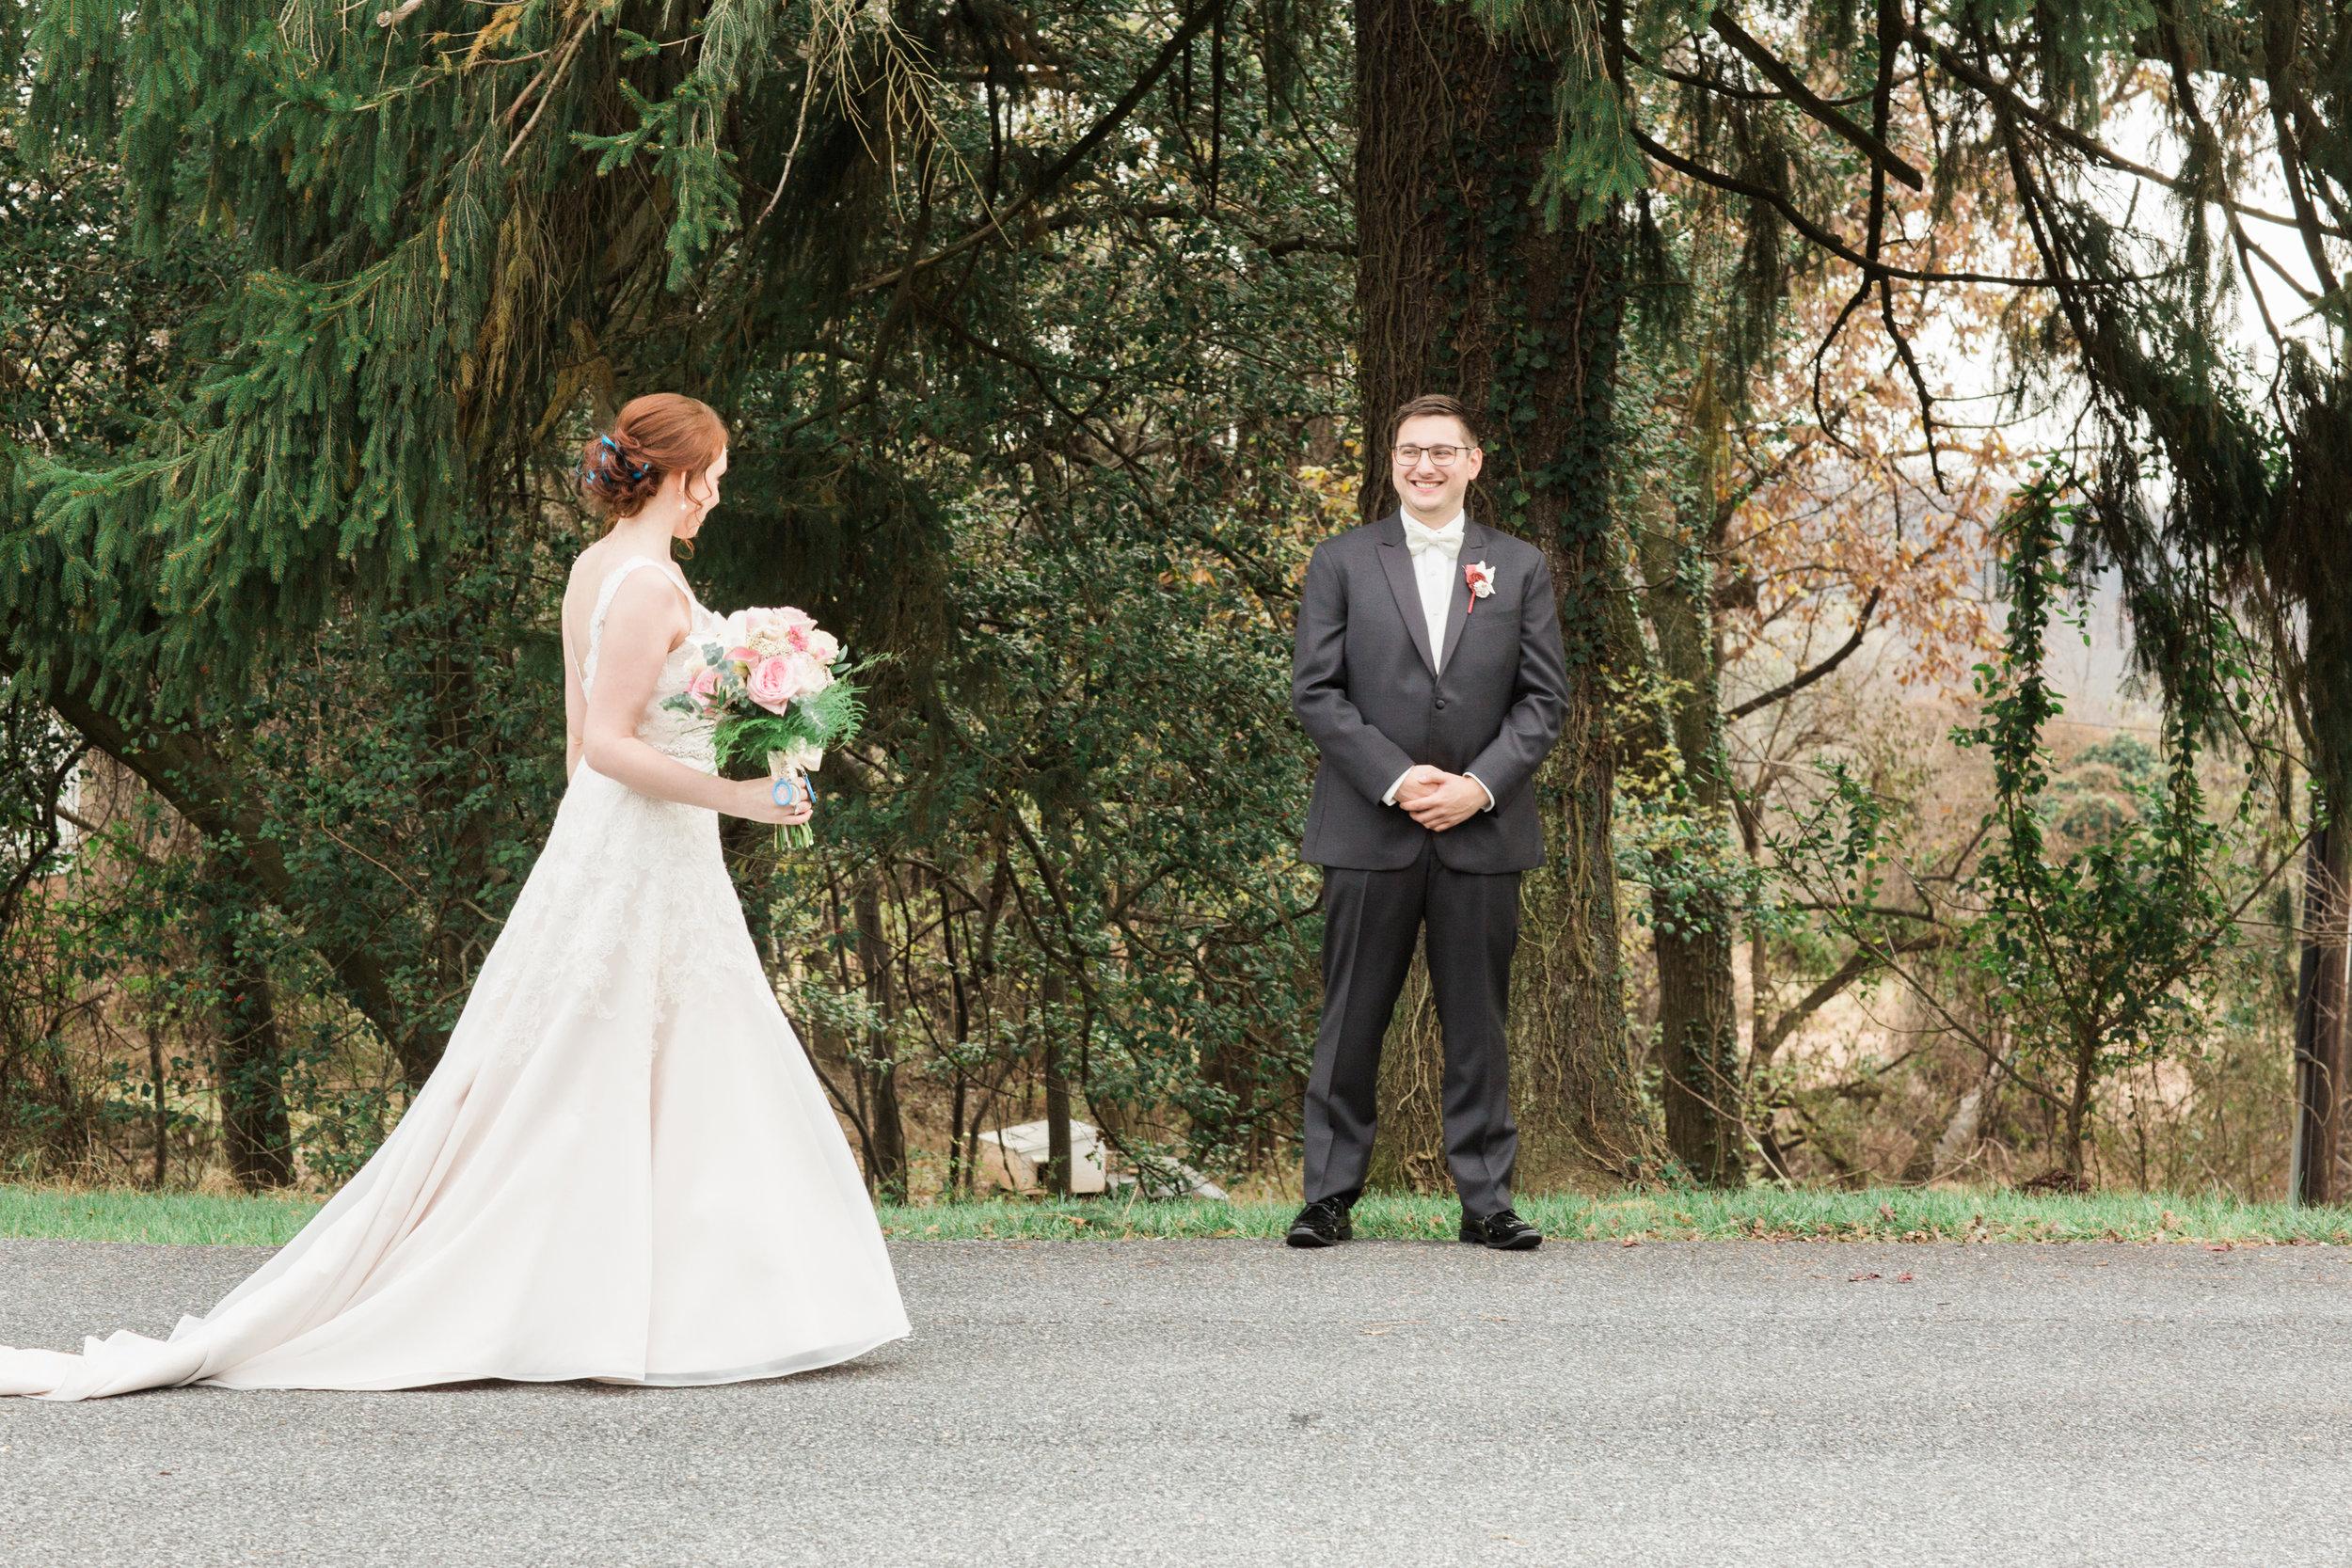 Harry Potter Wedding at Overhills Mansion Catonville Maryland Wedding Photographers Megapixels Media (46 of 134).jpg